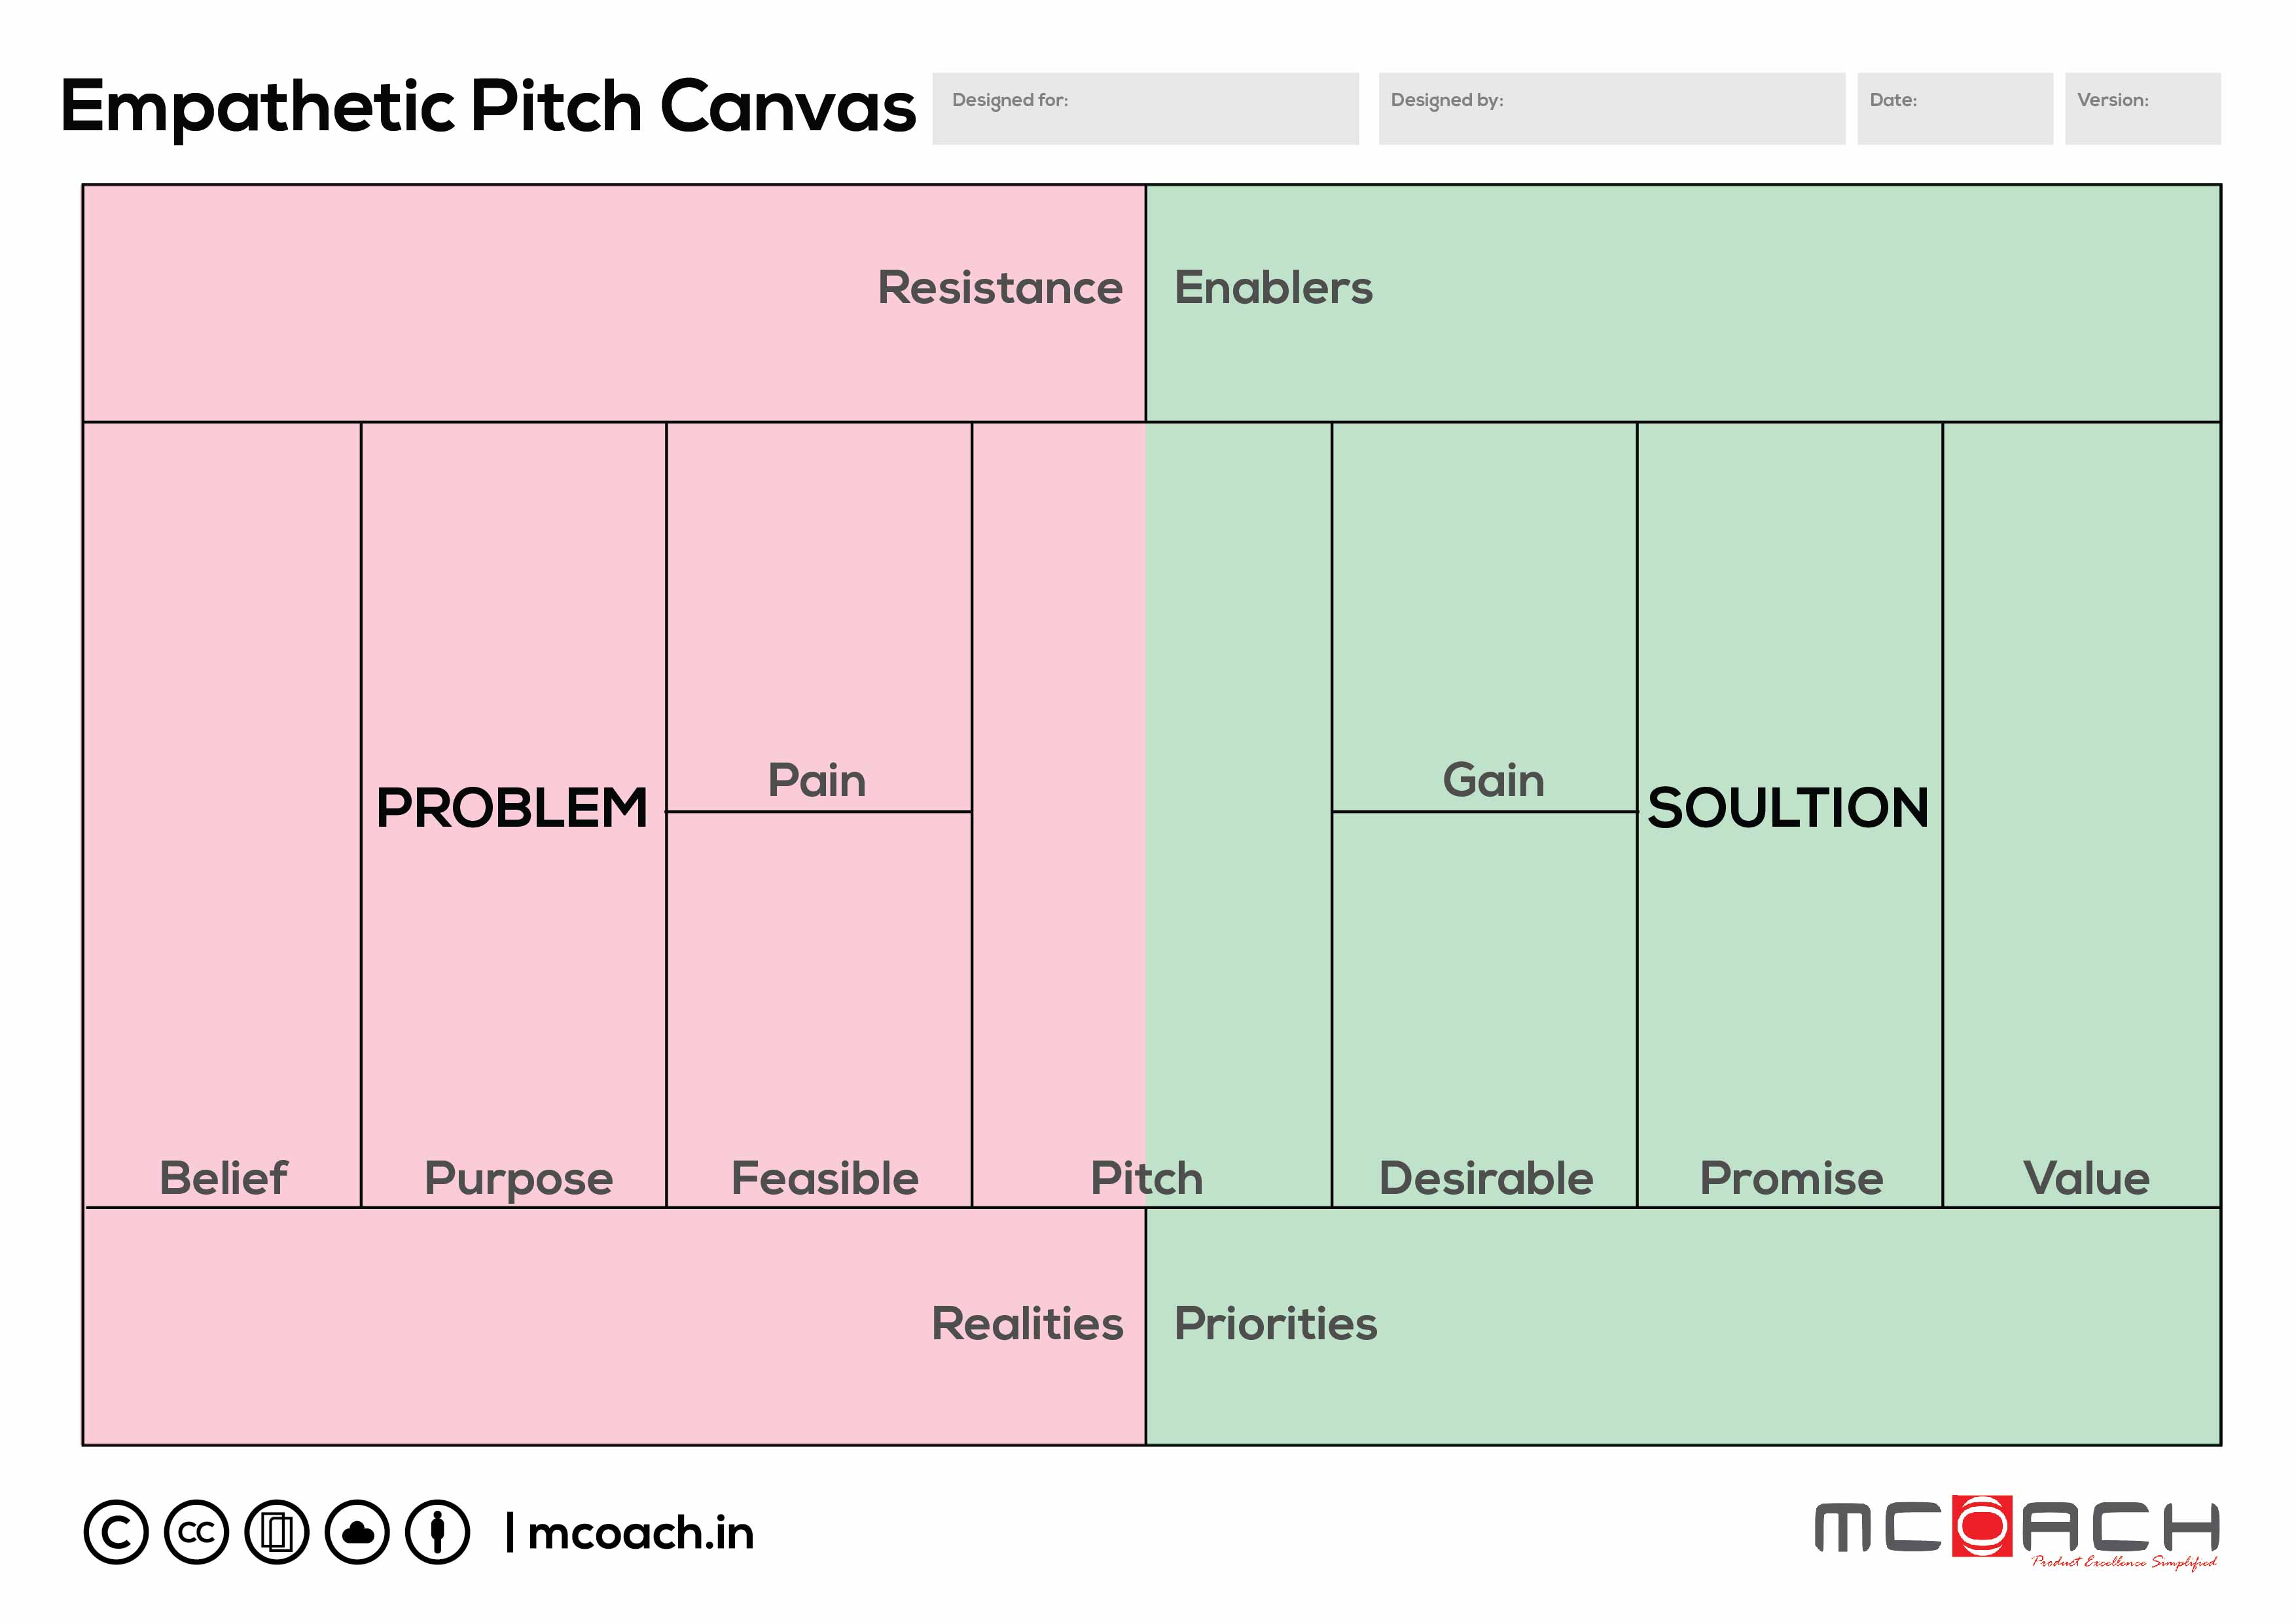 empathetic pitch canvas